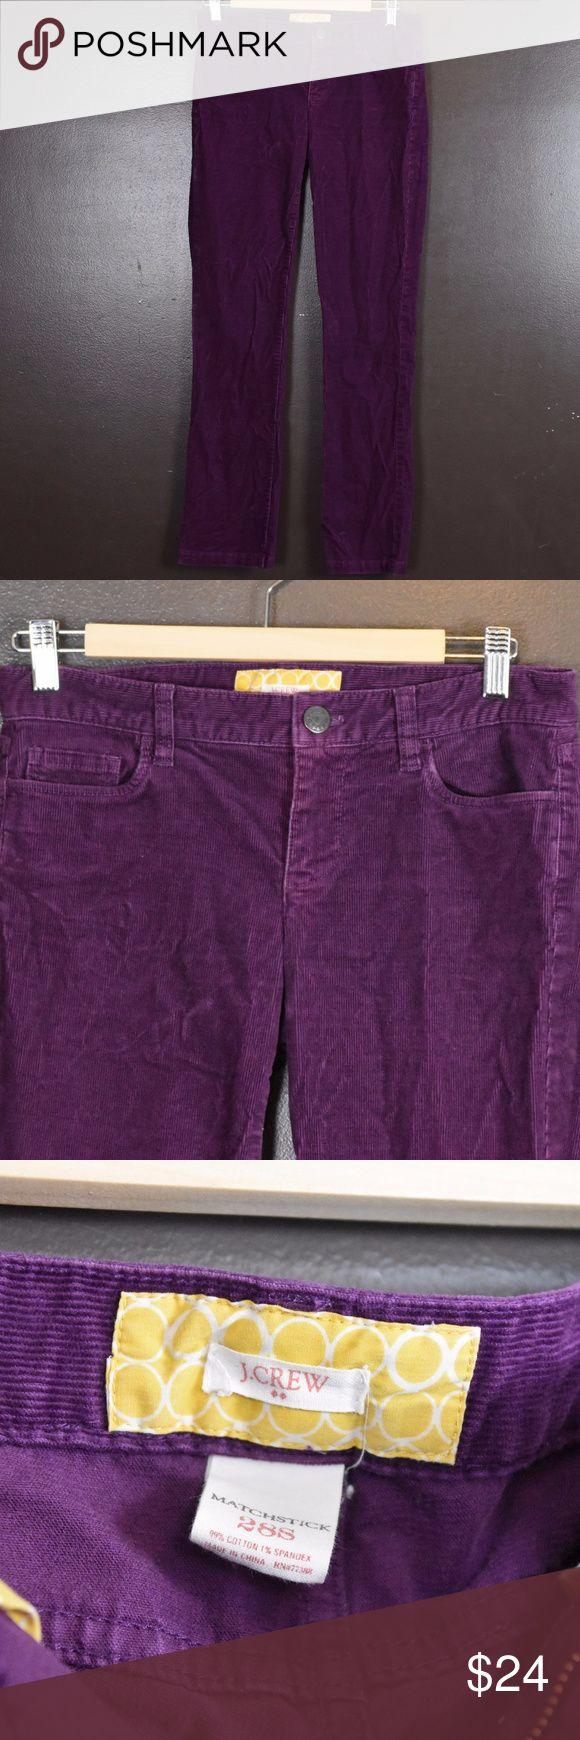 Women's J. Crew Matchstick Cords, Size 28S Women's J. Crew Factory Matchstick Cords, Size 28S J. Crew Factory Pants Skinny